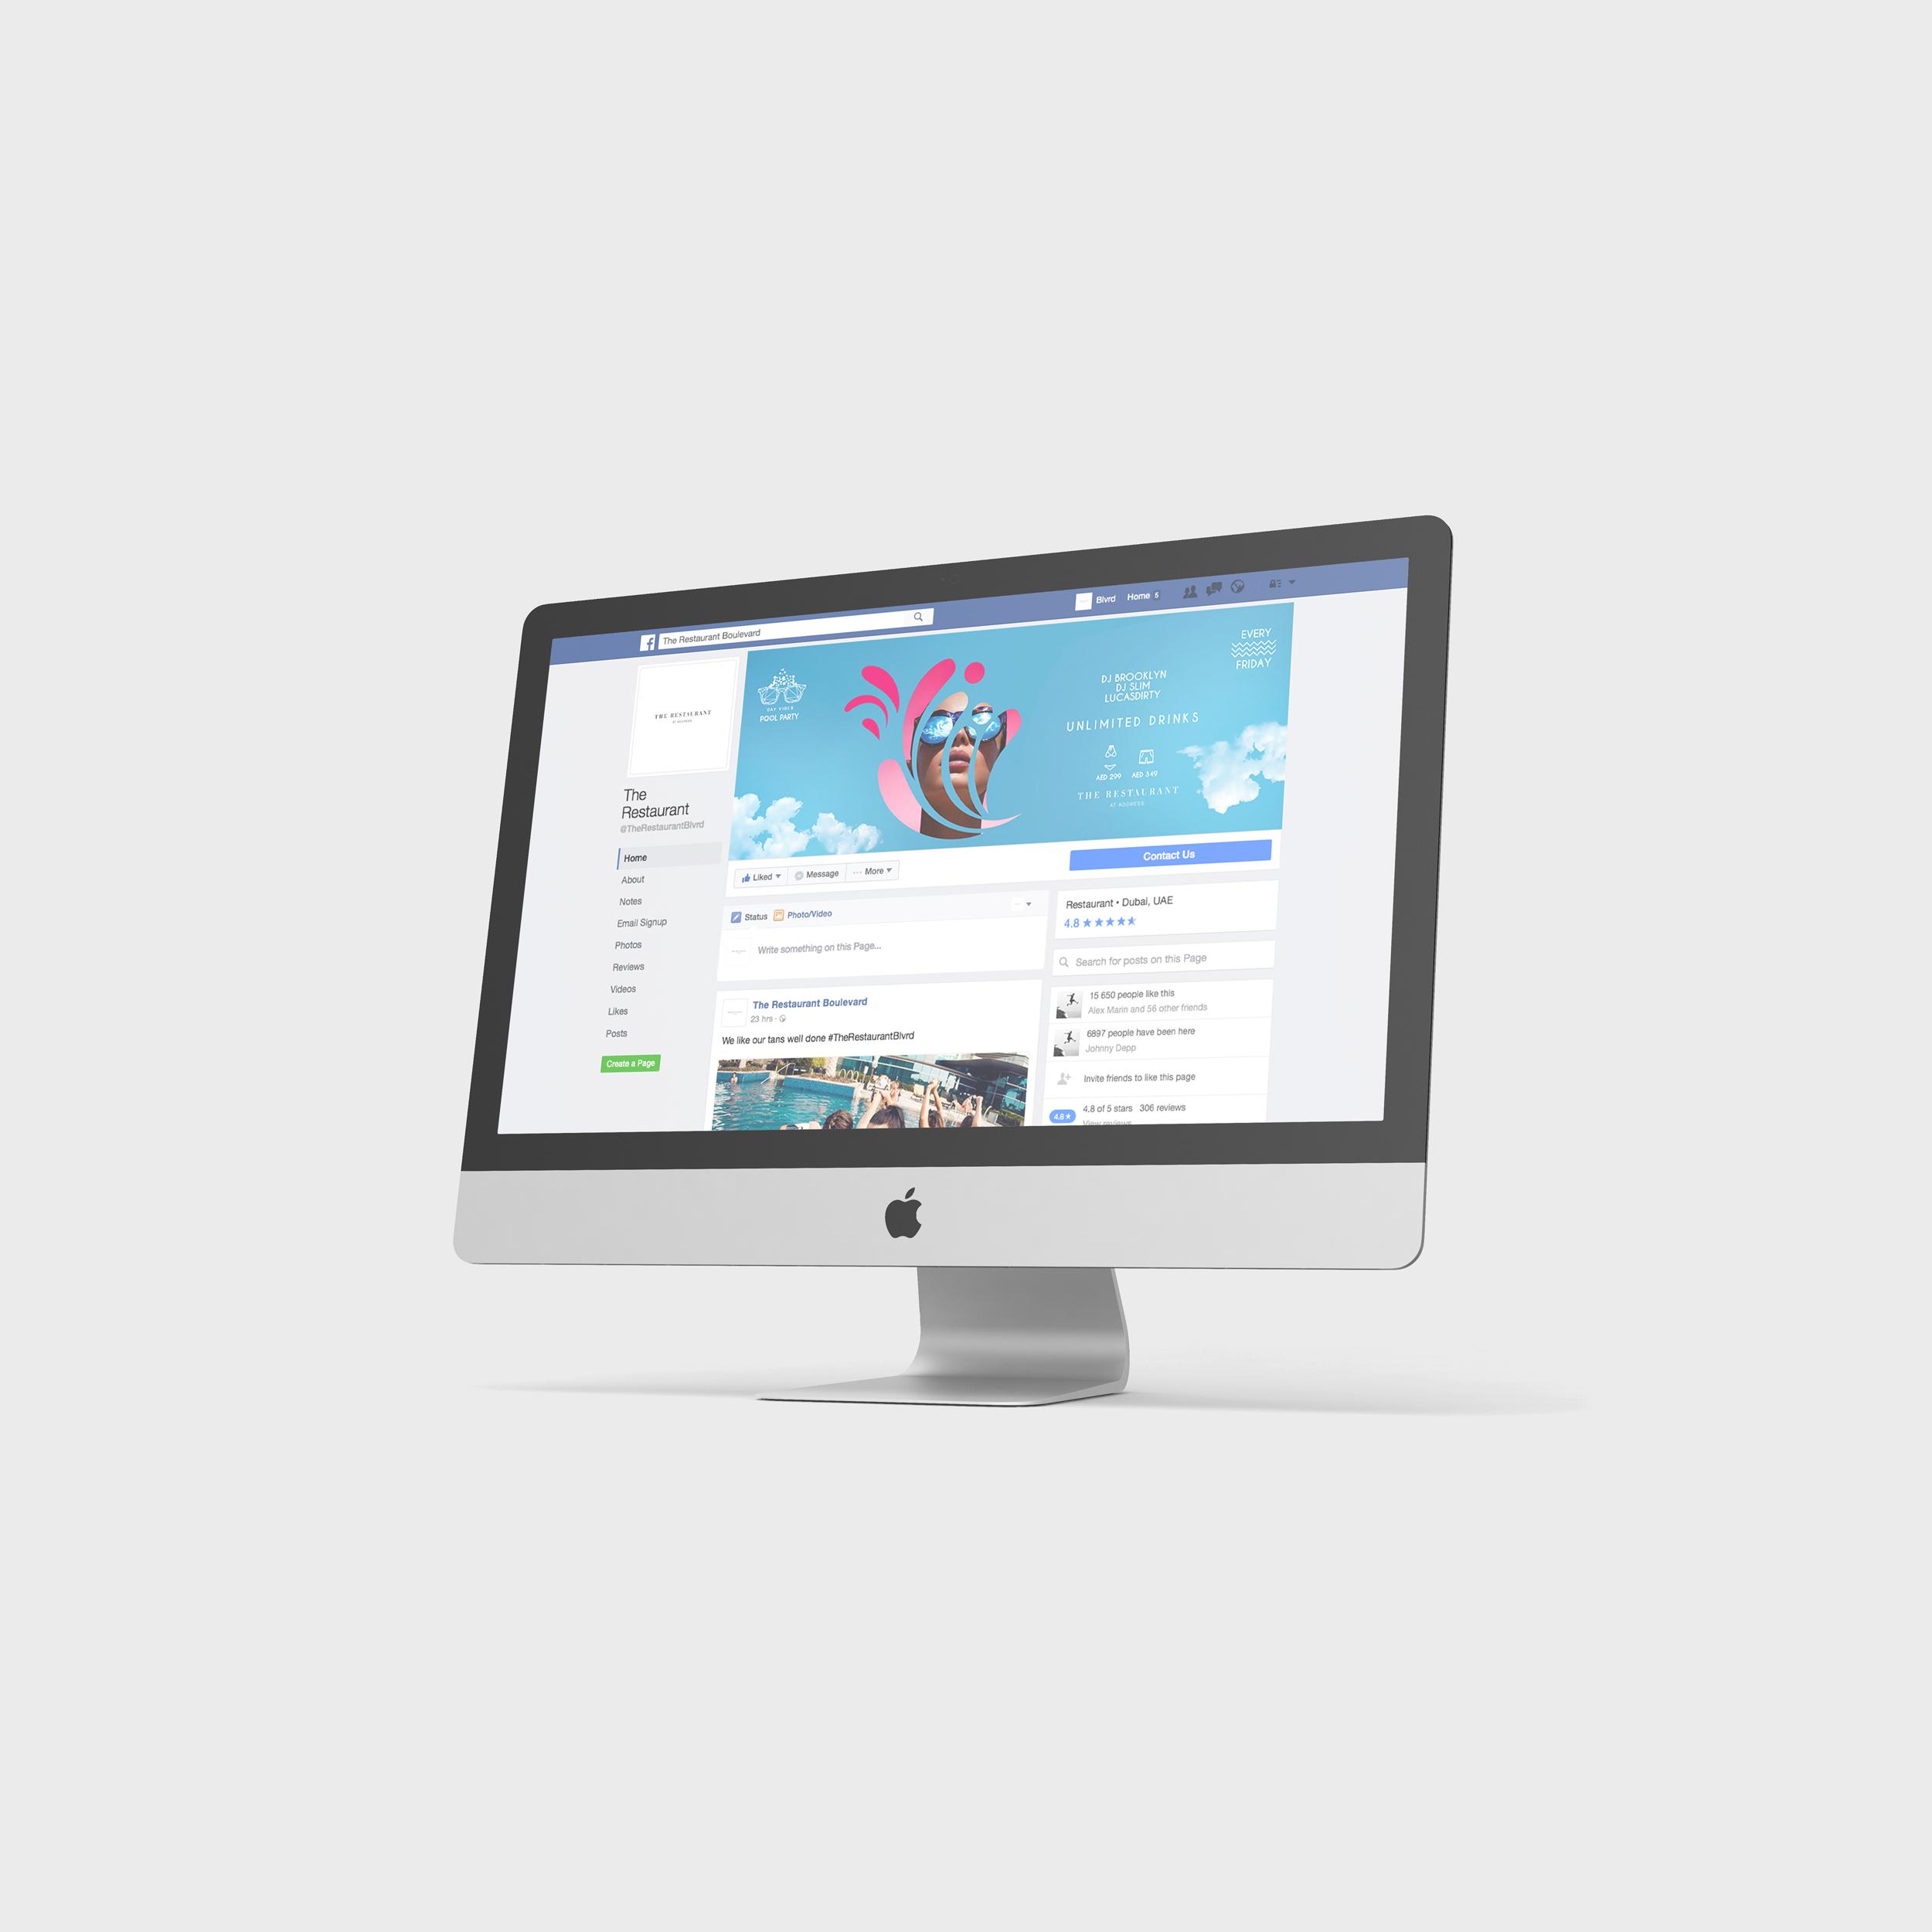 iMac-27'-2012-3